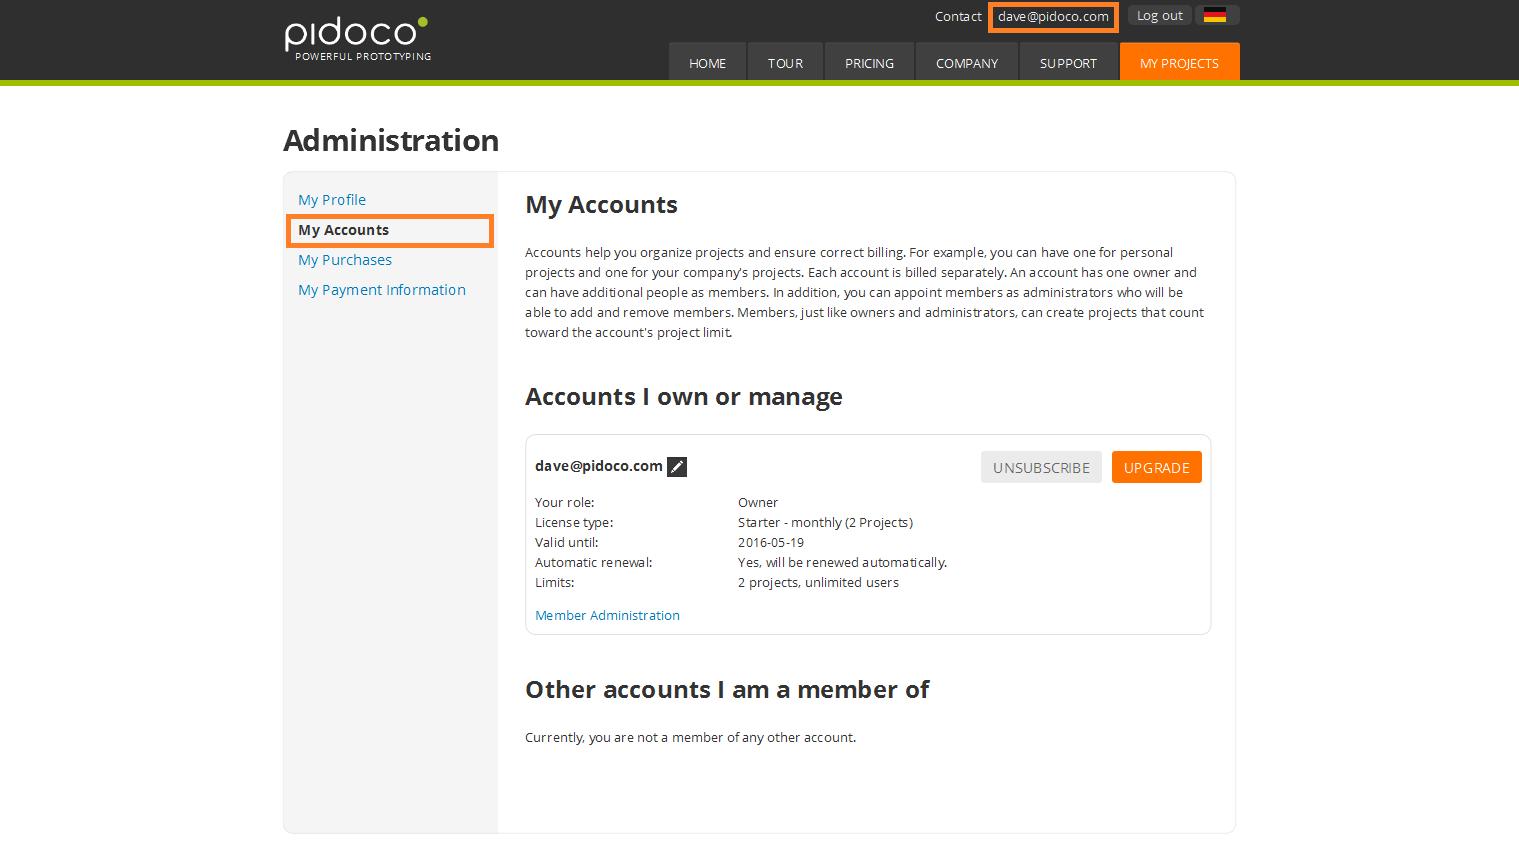 German/customer/account/create - German/customer/account/create 1